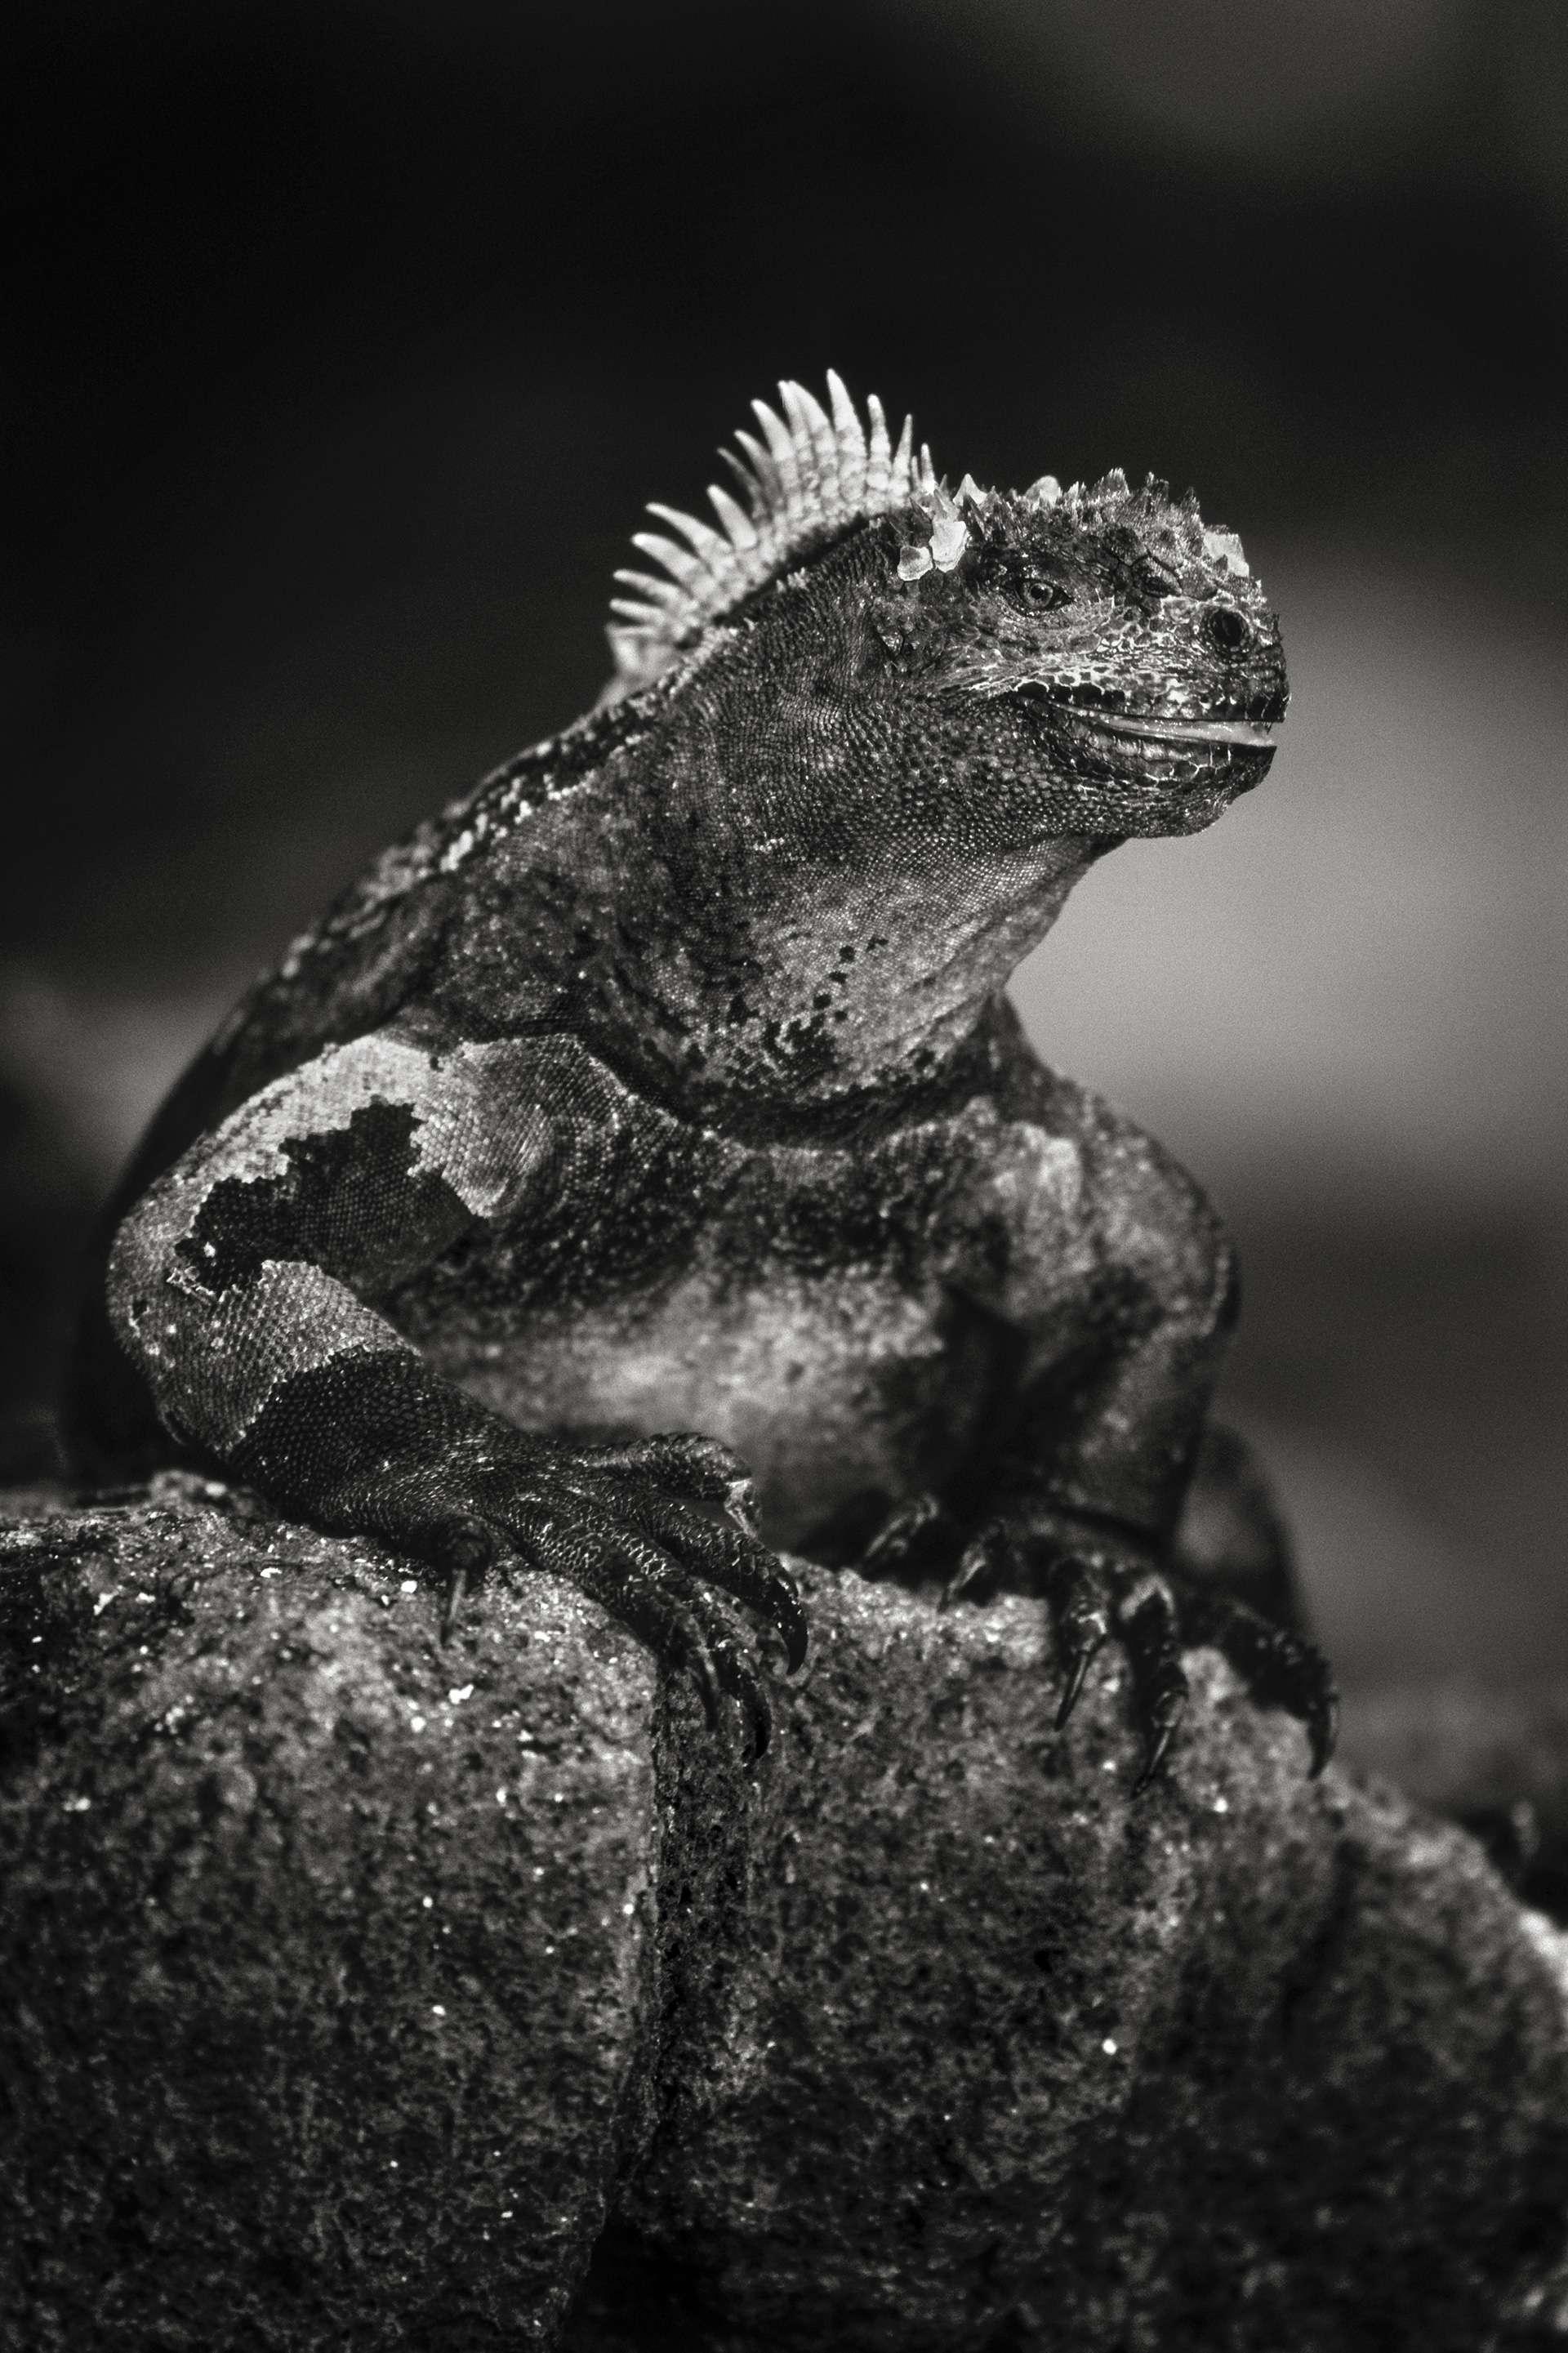 Photographie de Gilles Martin : iguane marin des Iles Galapagos, Struggle for life